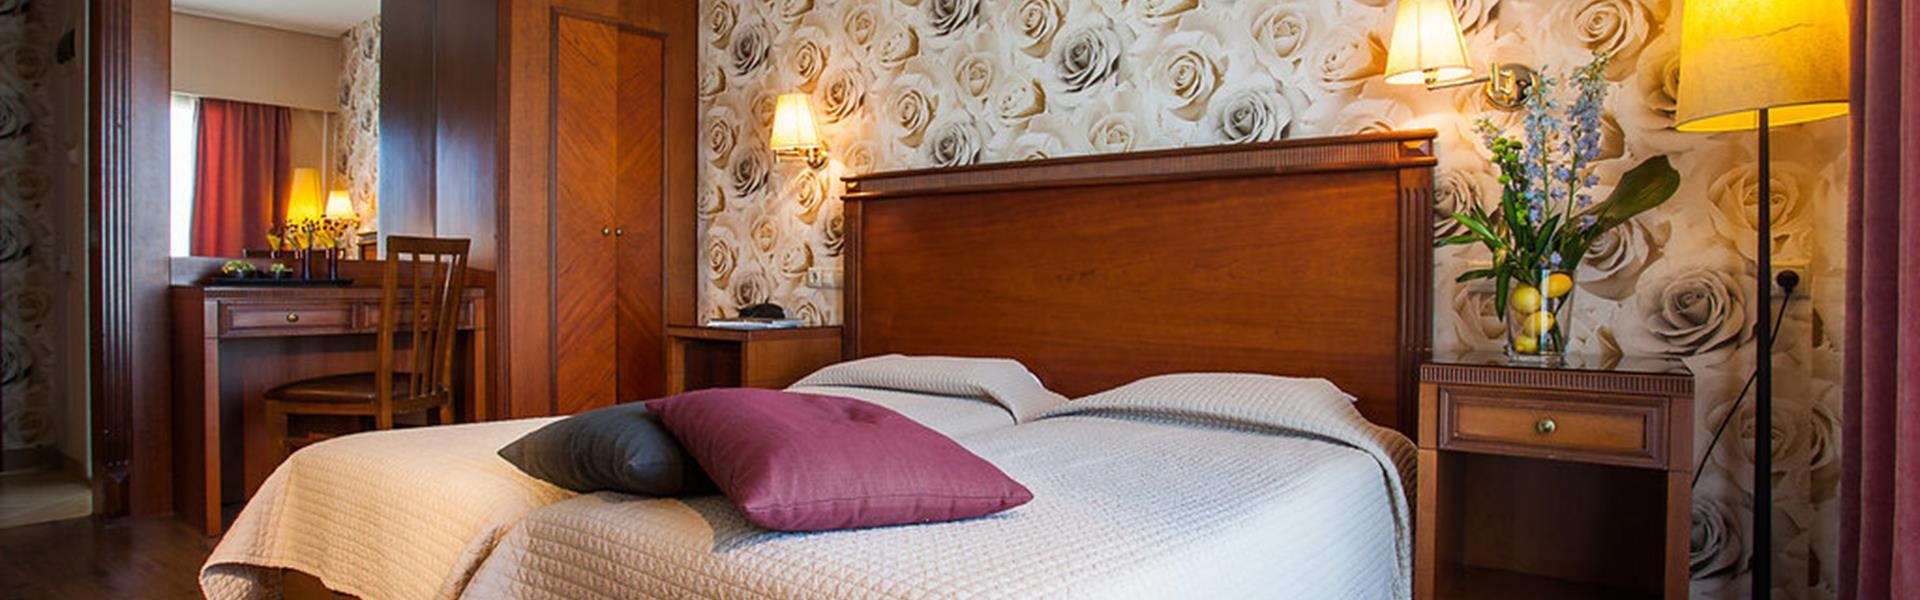 Hotel El Greco Thessaloniki City Center